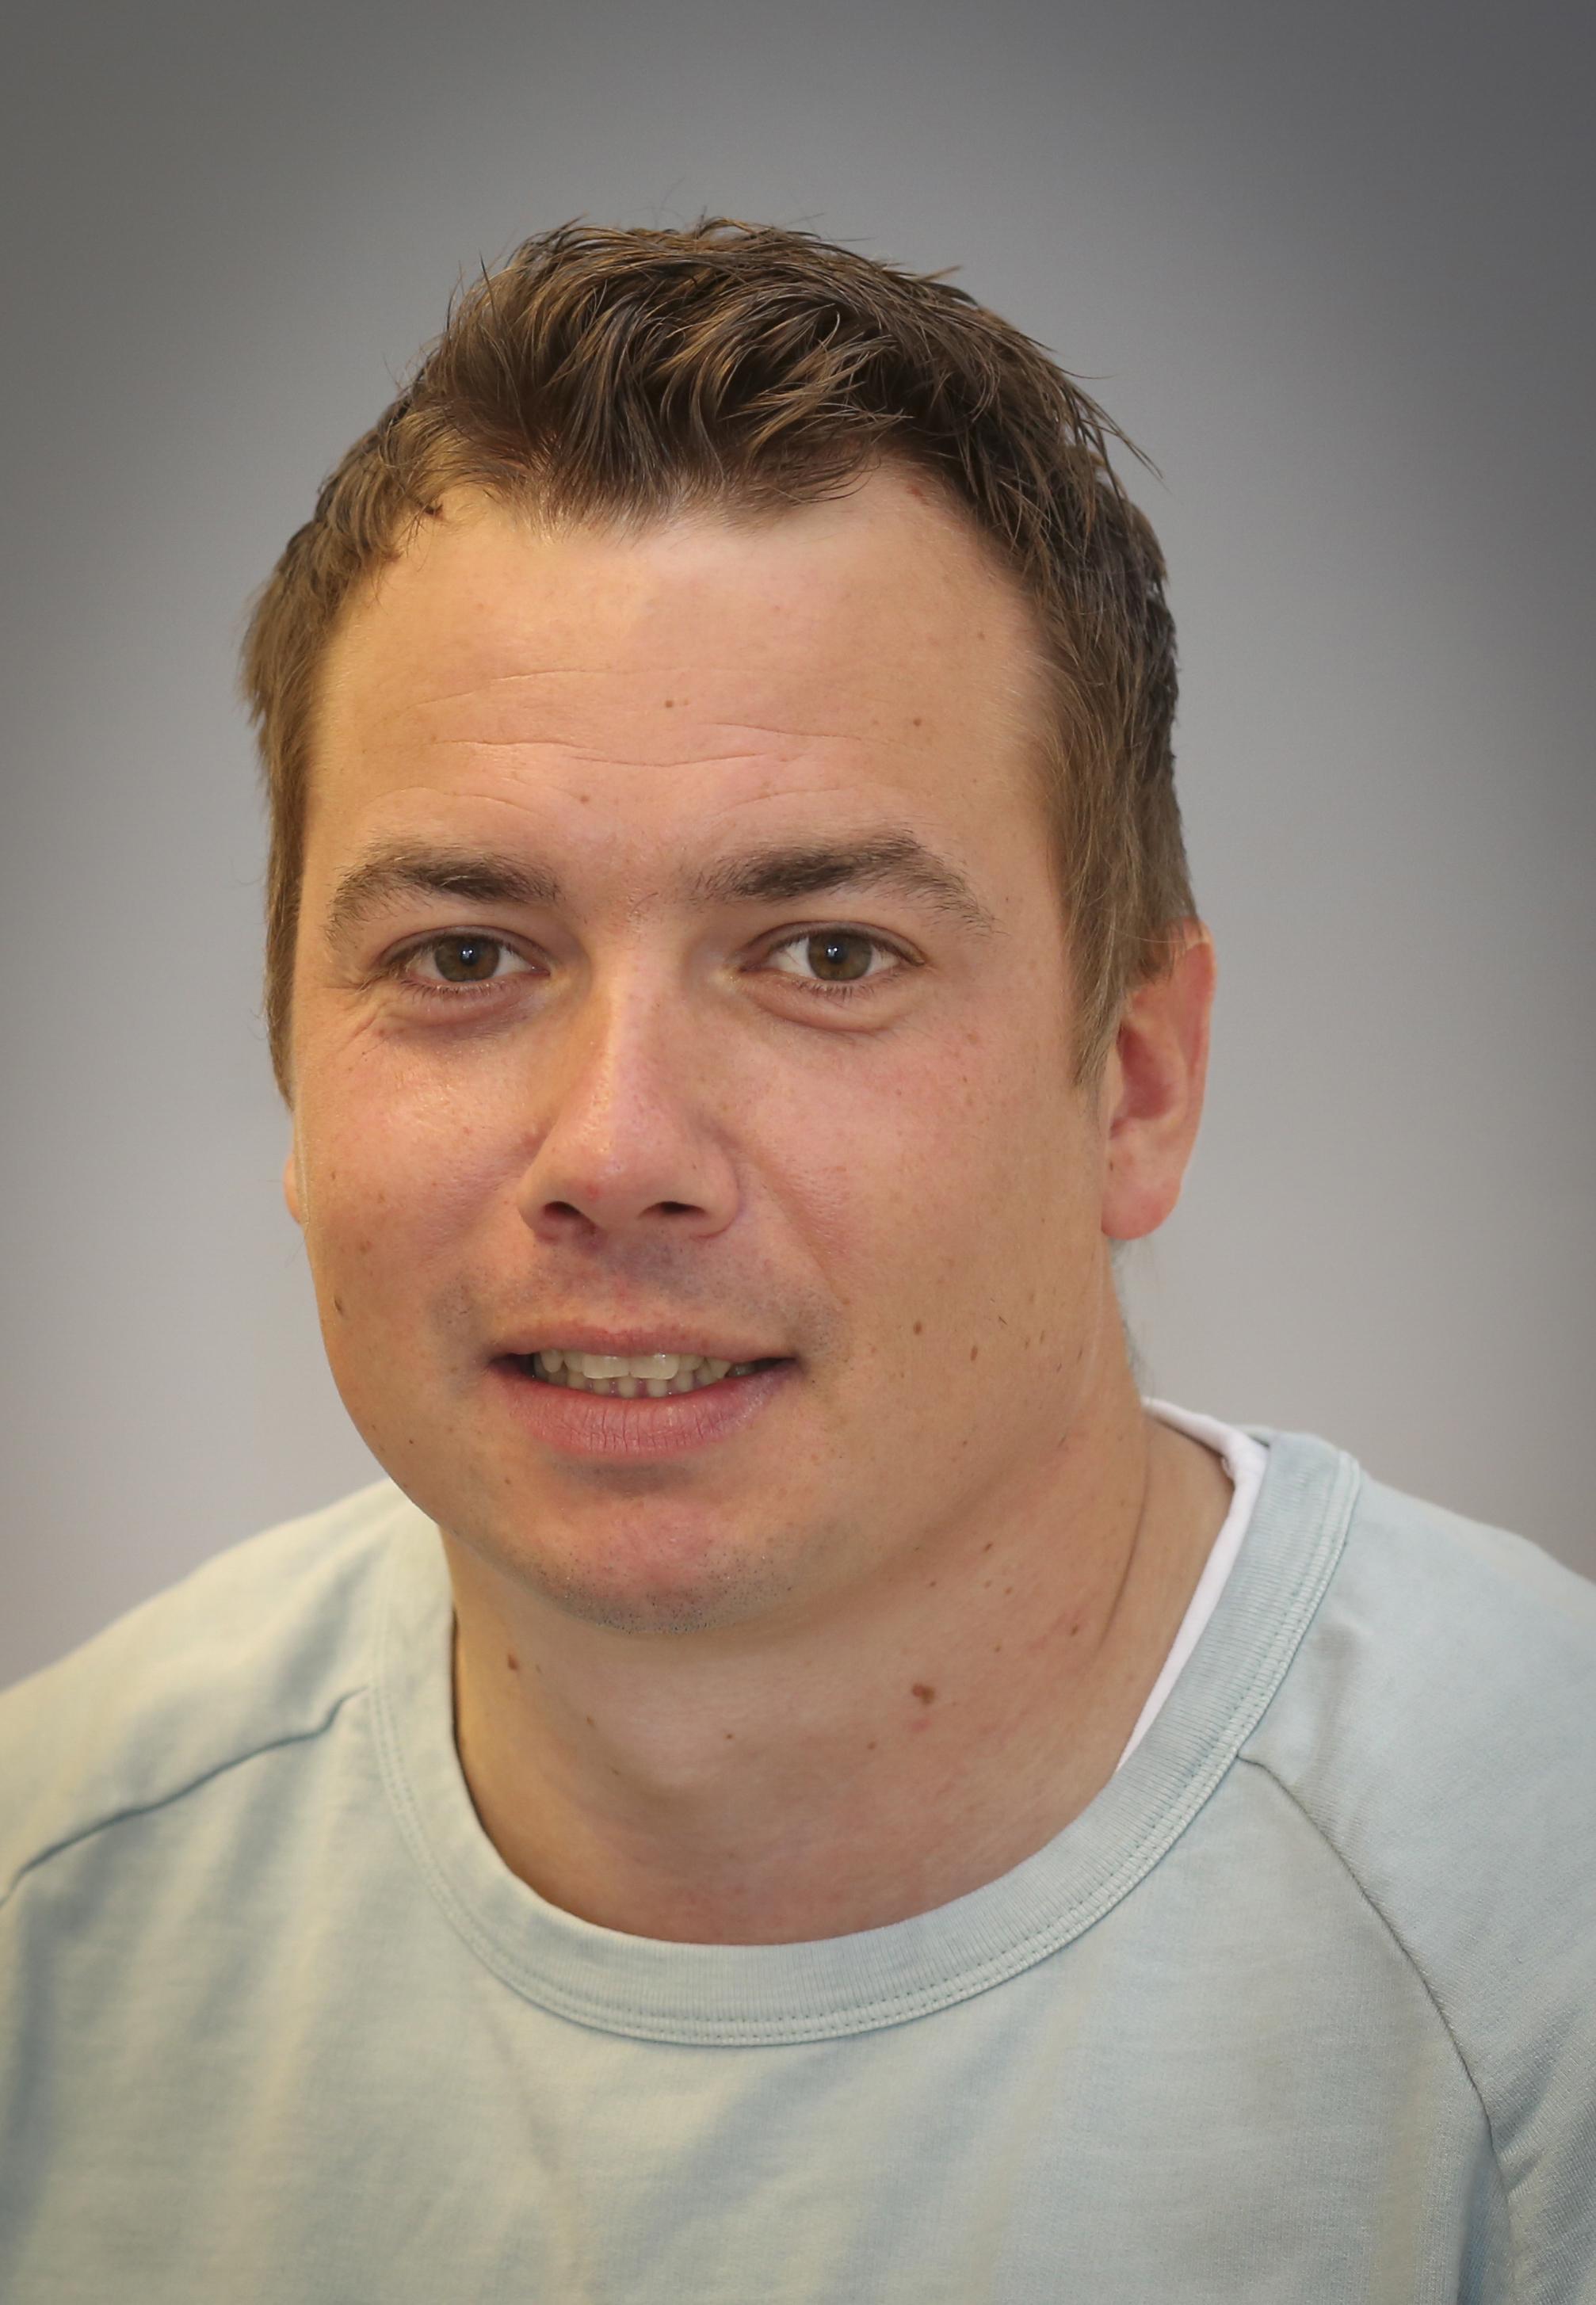 Dennis Haarup Karlsen